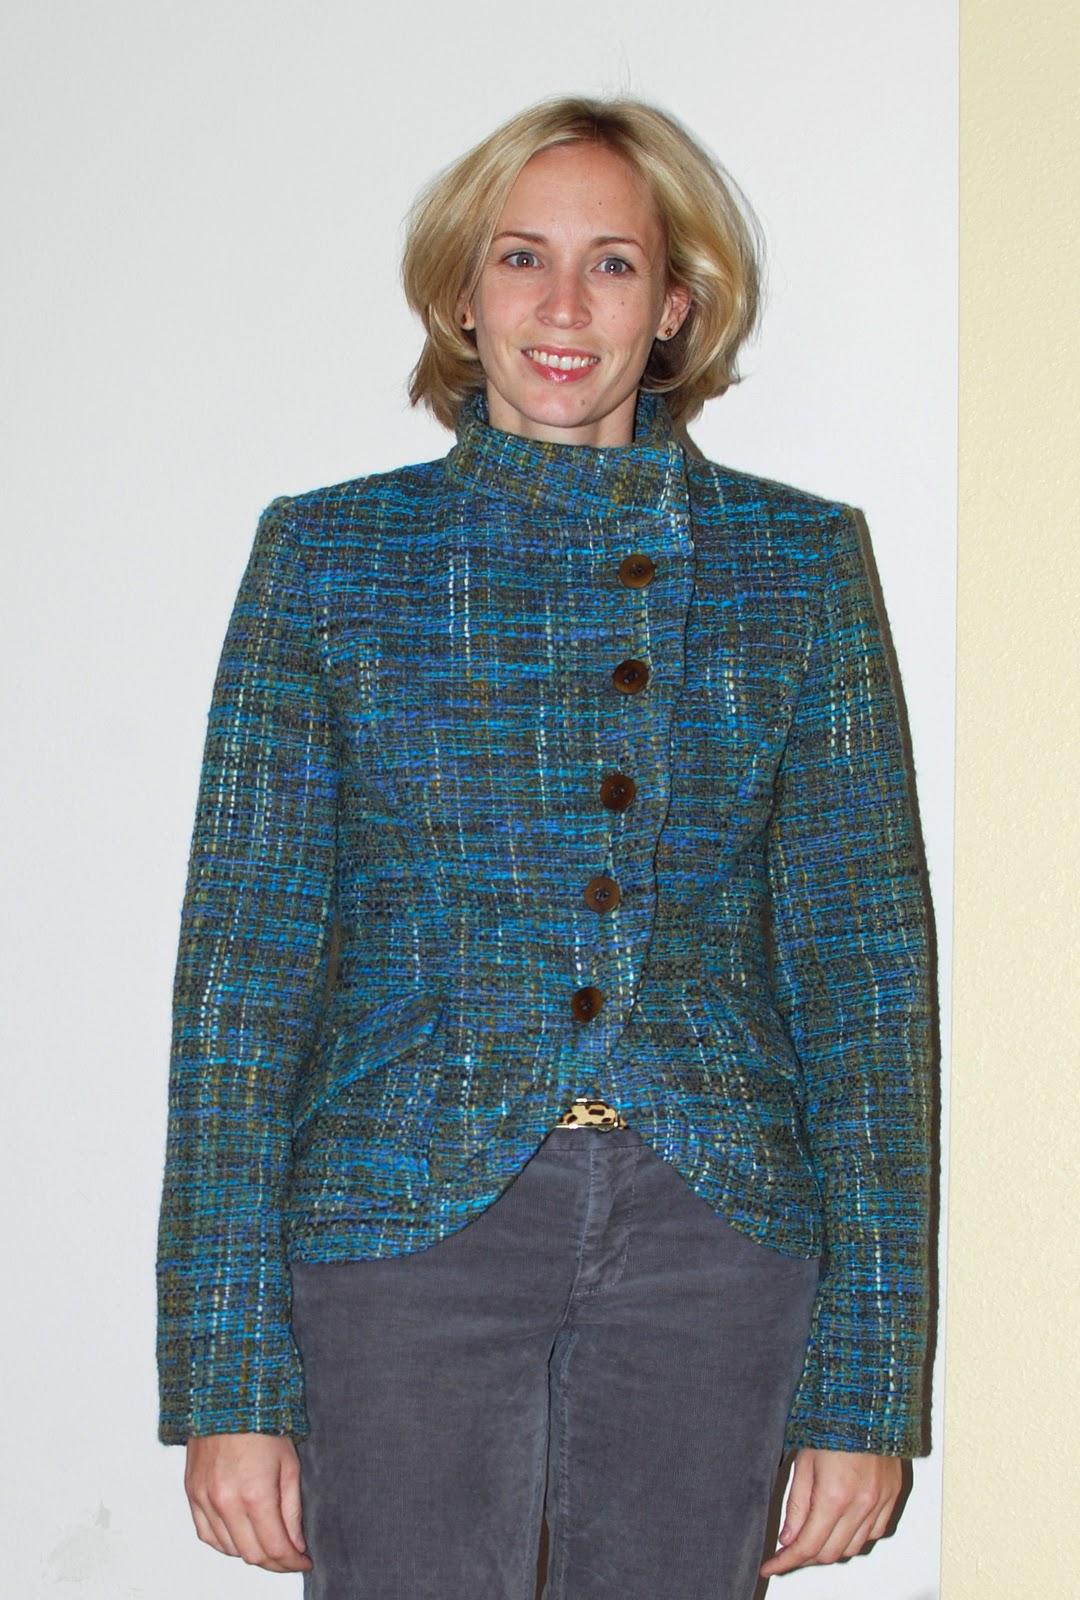 Knitting Jenny Basics : Knitting jenny mccalls